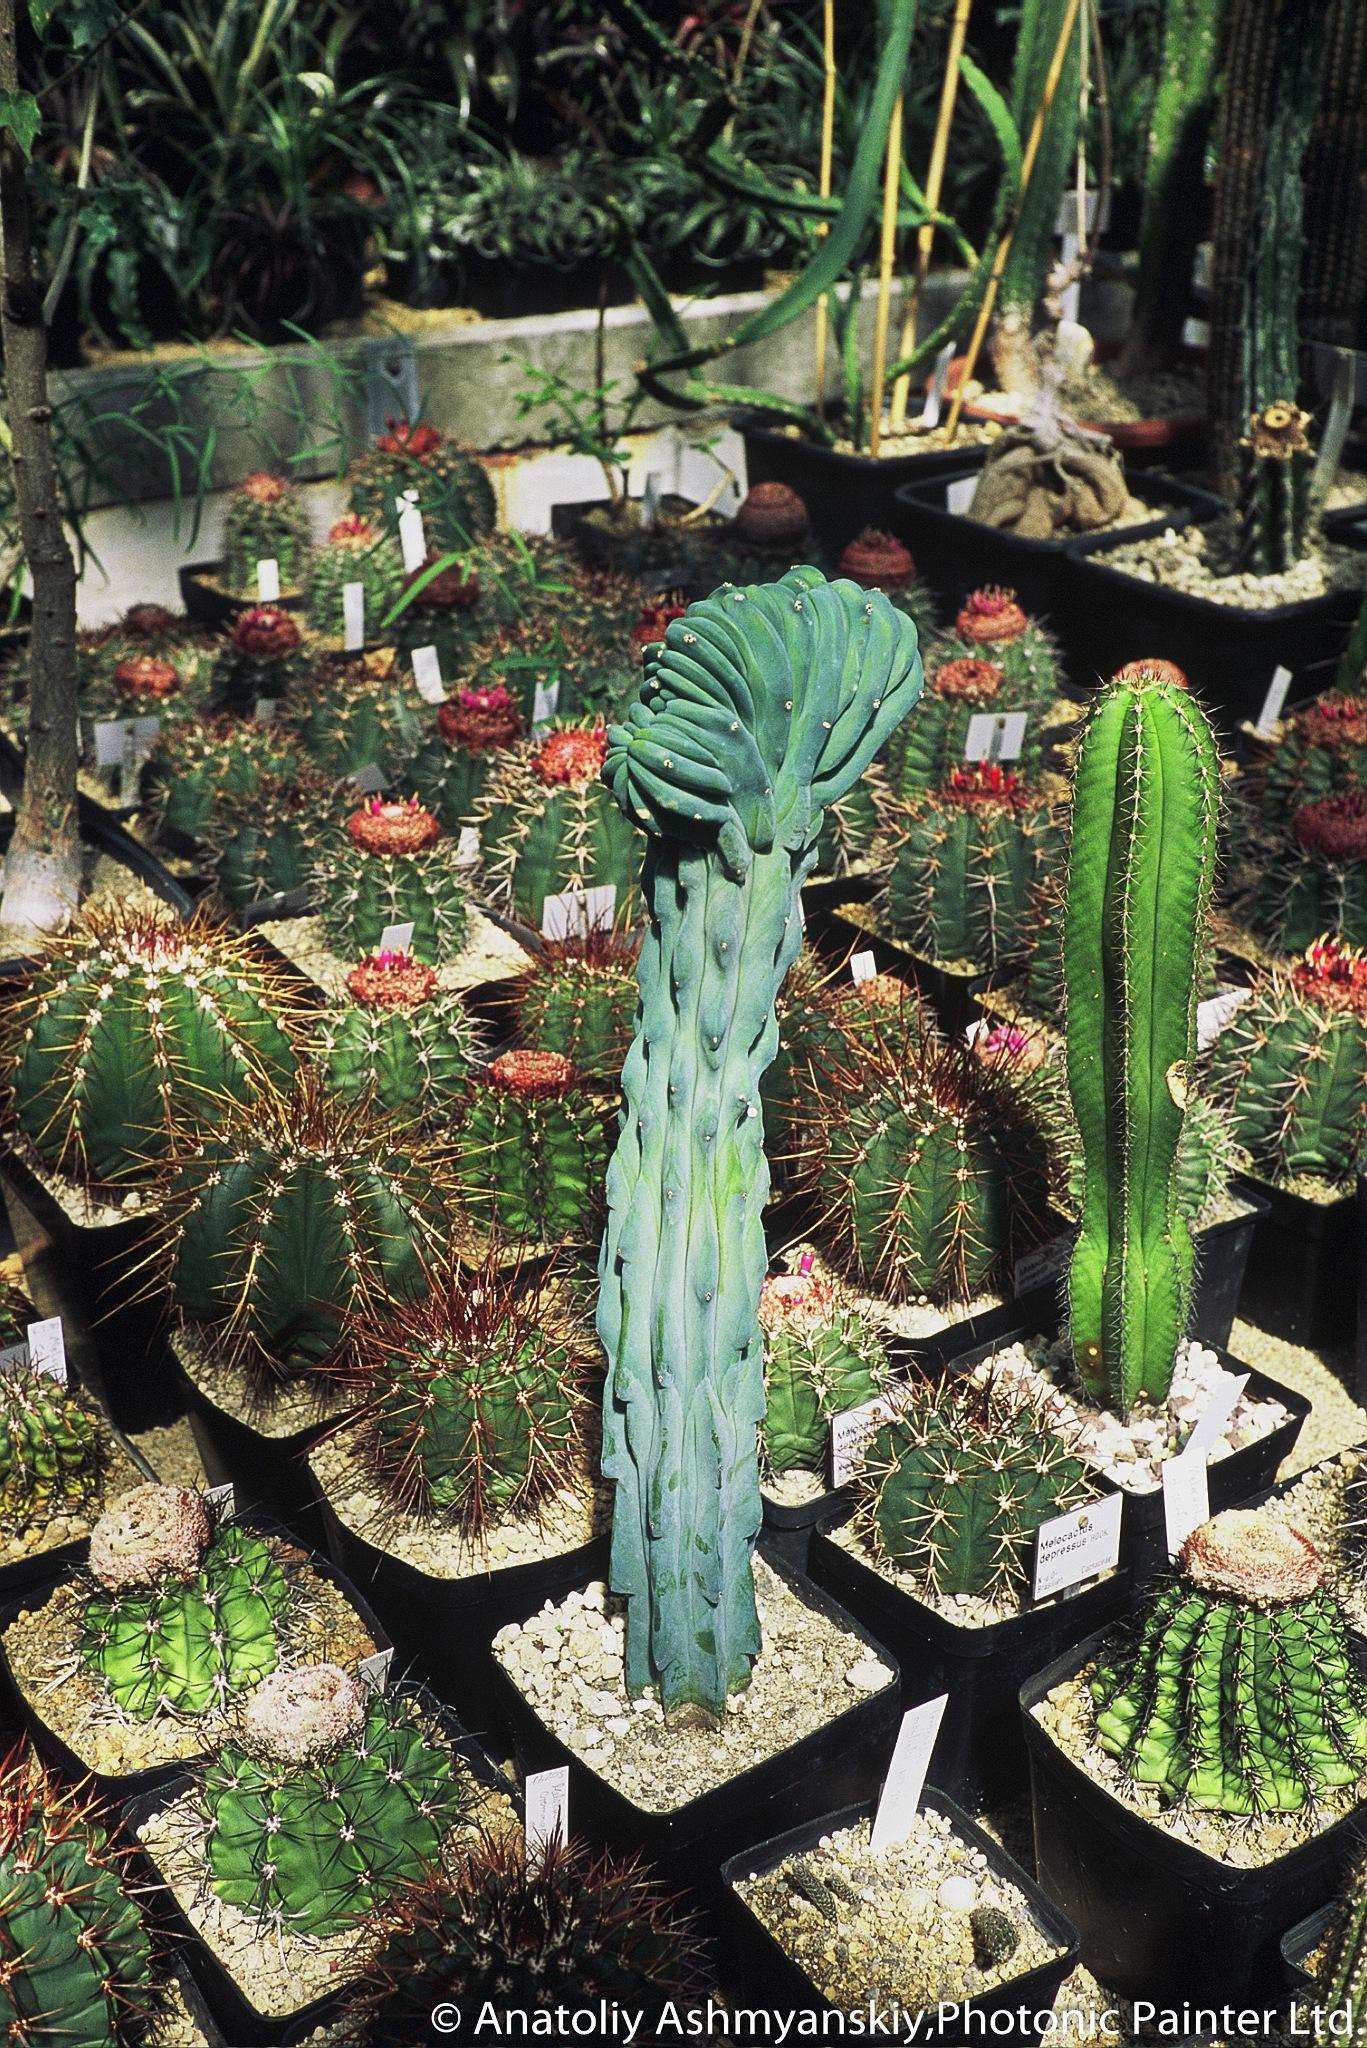 Brainy Cactus by Anatoliy Ashmyanskiy